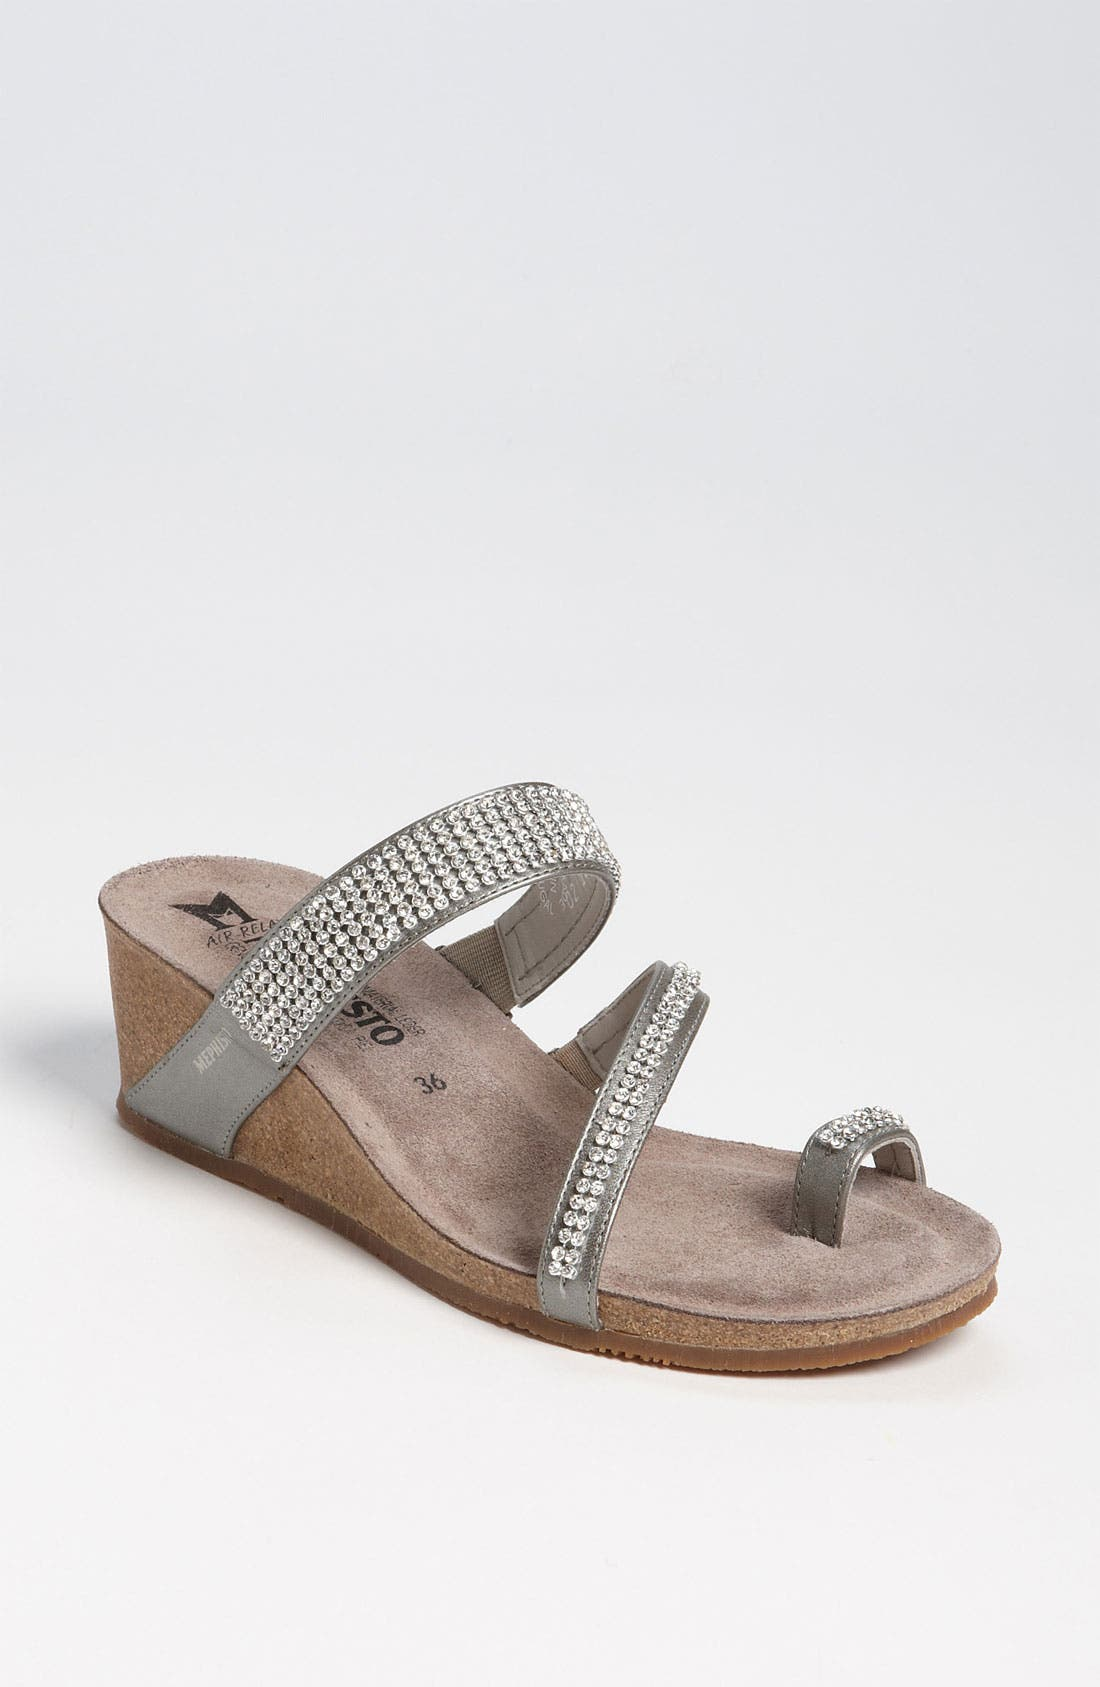 Main Image - Mephisto 'Milly' Sandal